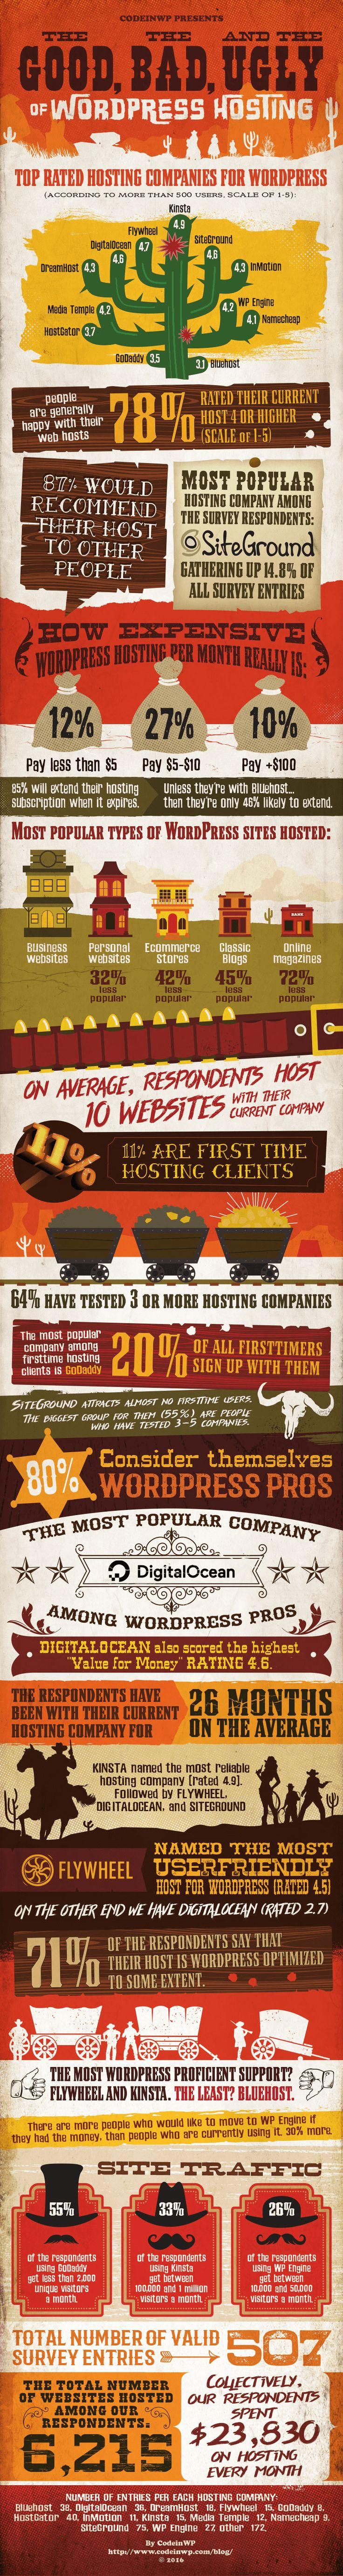 WordPress hosting infographic